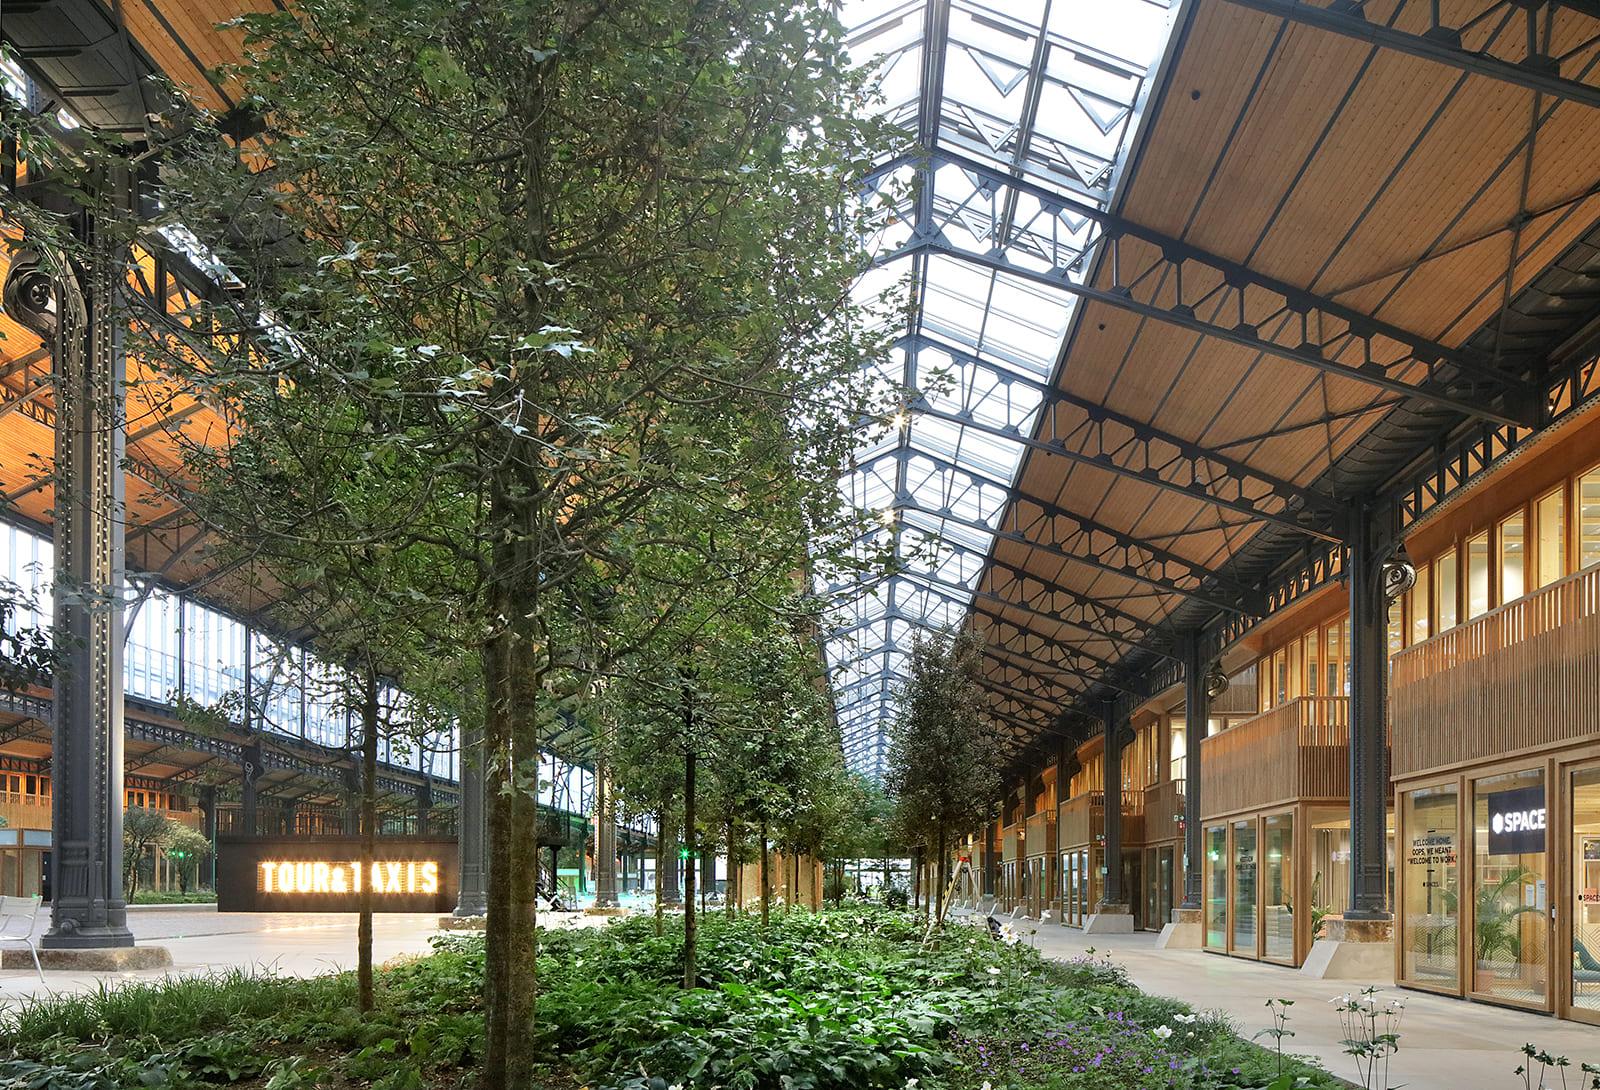 Gare Maritime Brussels  - 4.1 FilipDujardin HR 39